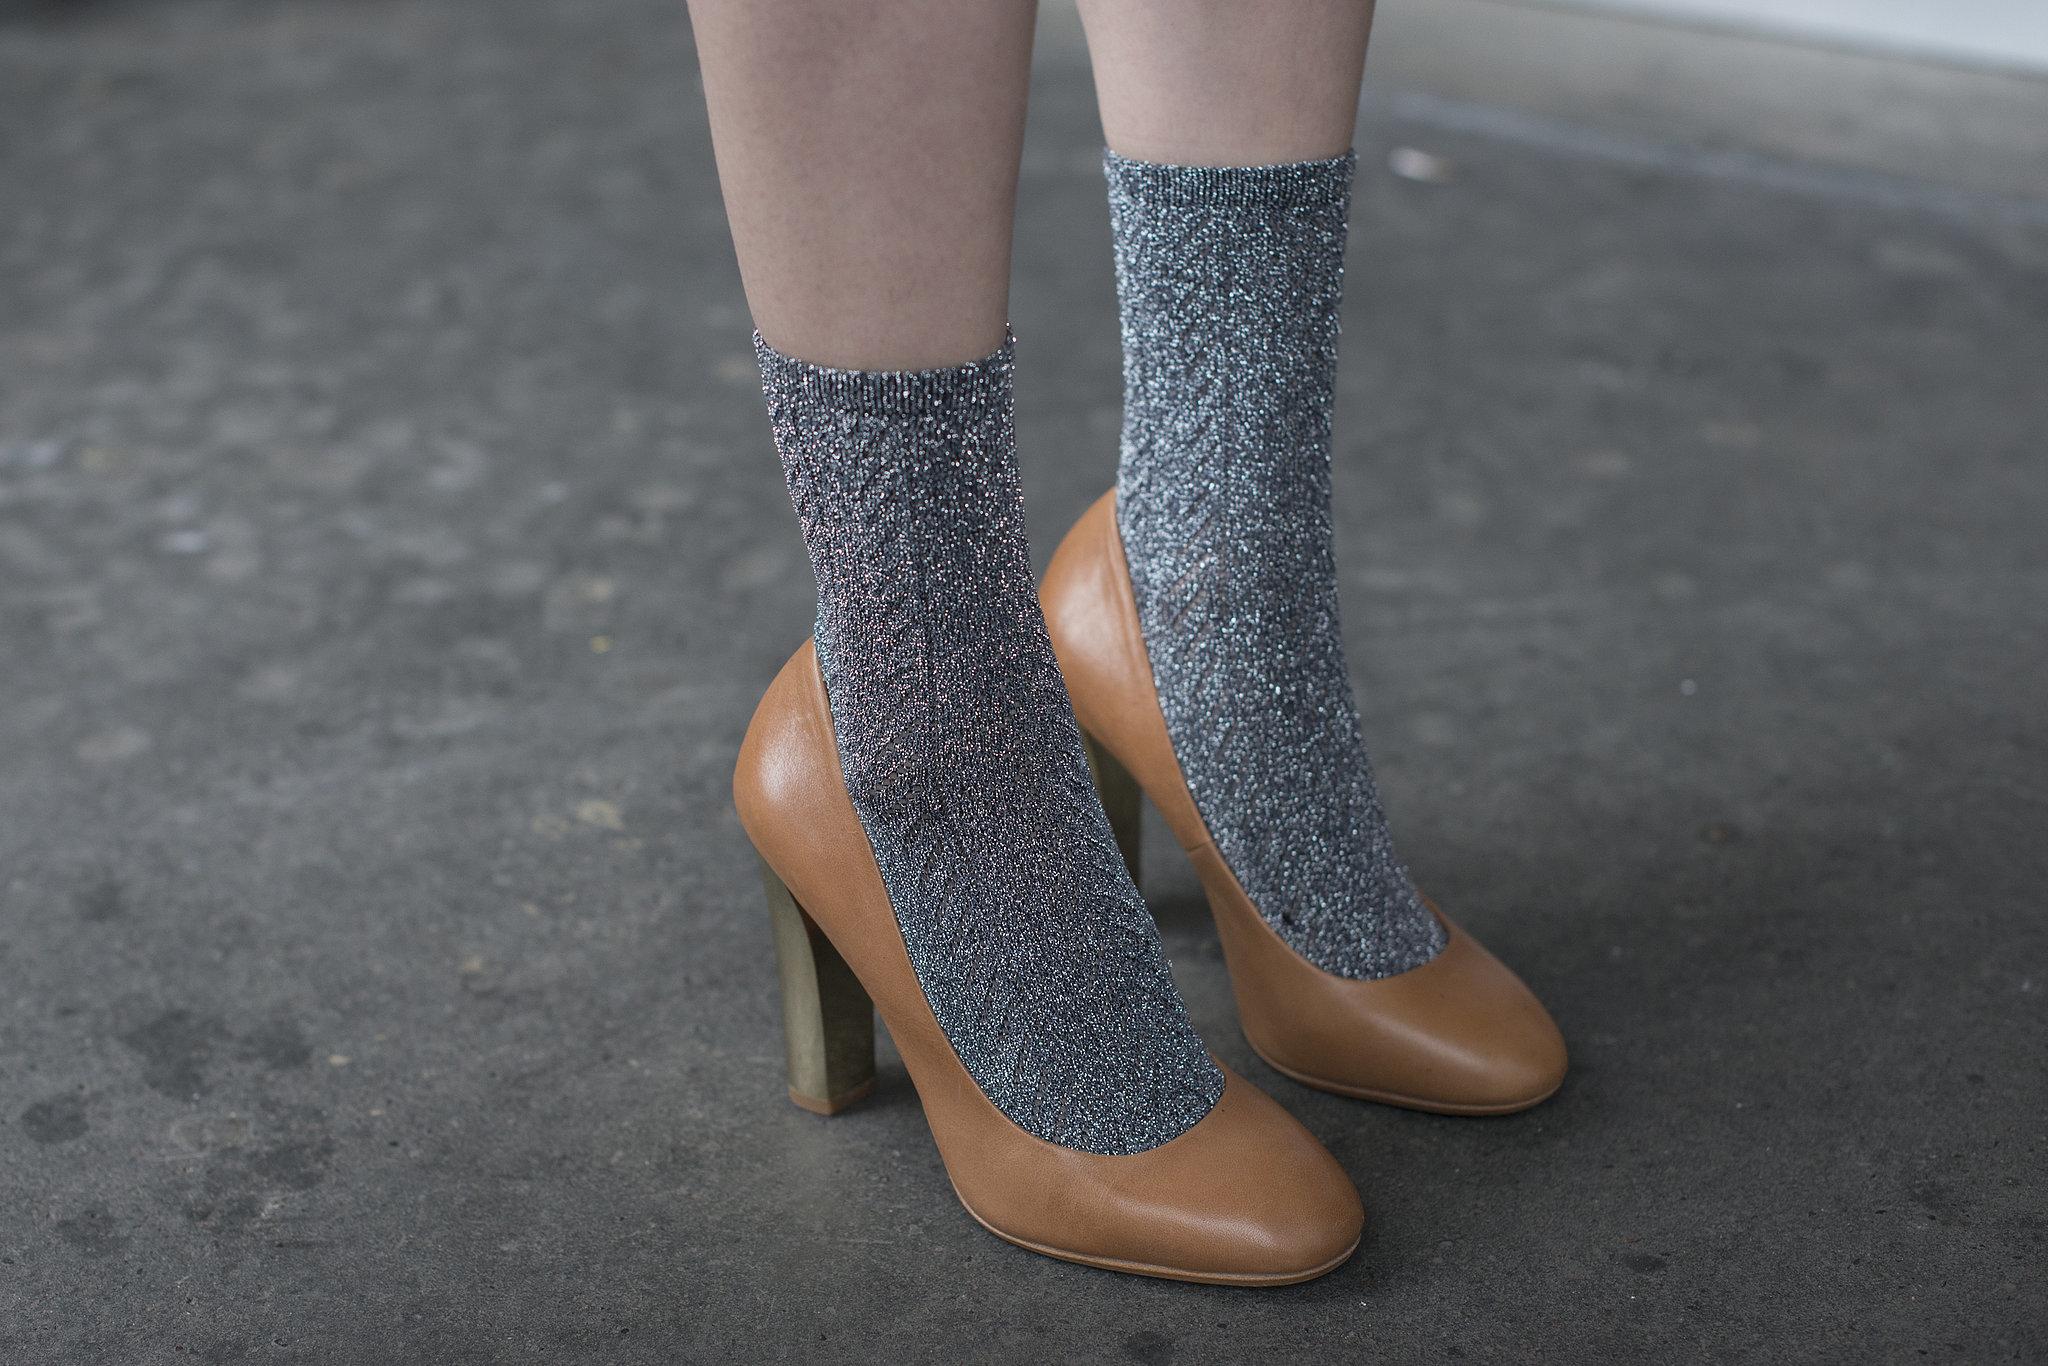 Socks sweeten up these pumps.